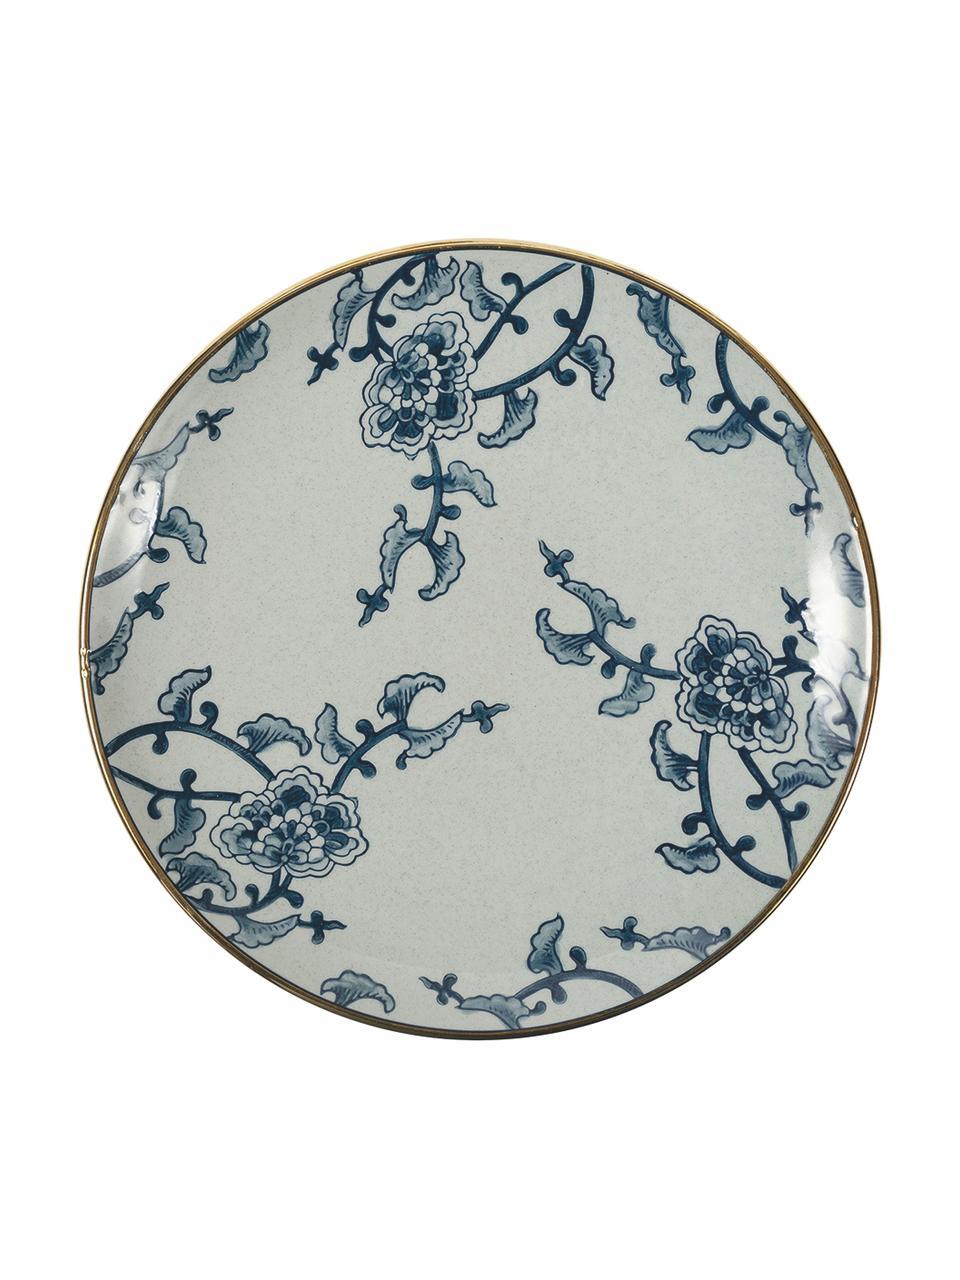 Set 18 piatti per 6 persone Hamasei, Porcellana, Bianco, blu scuro, Set in varie misure